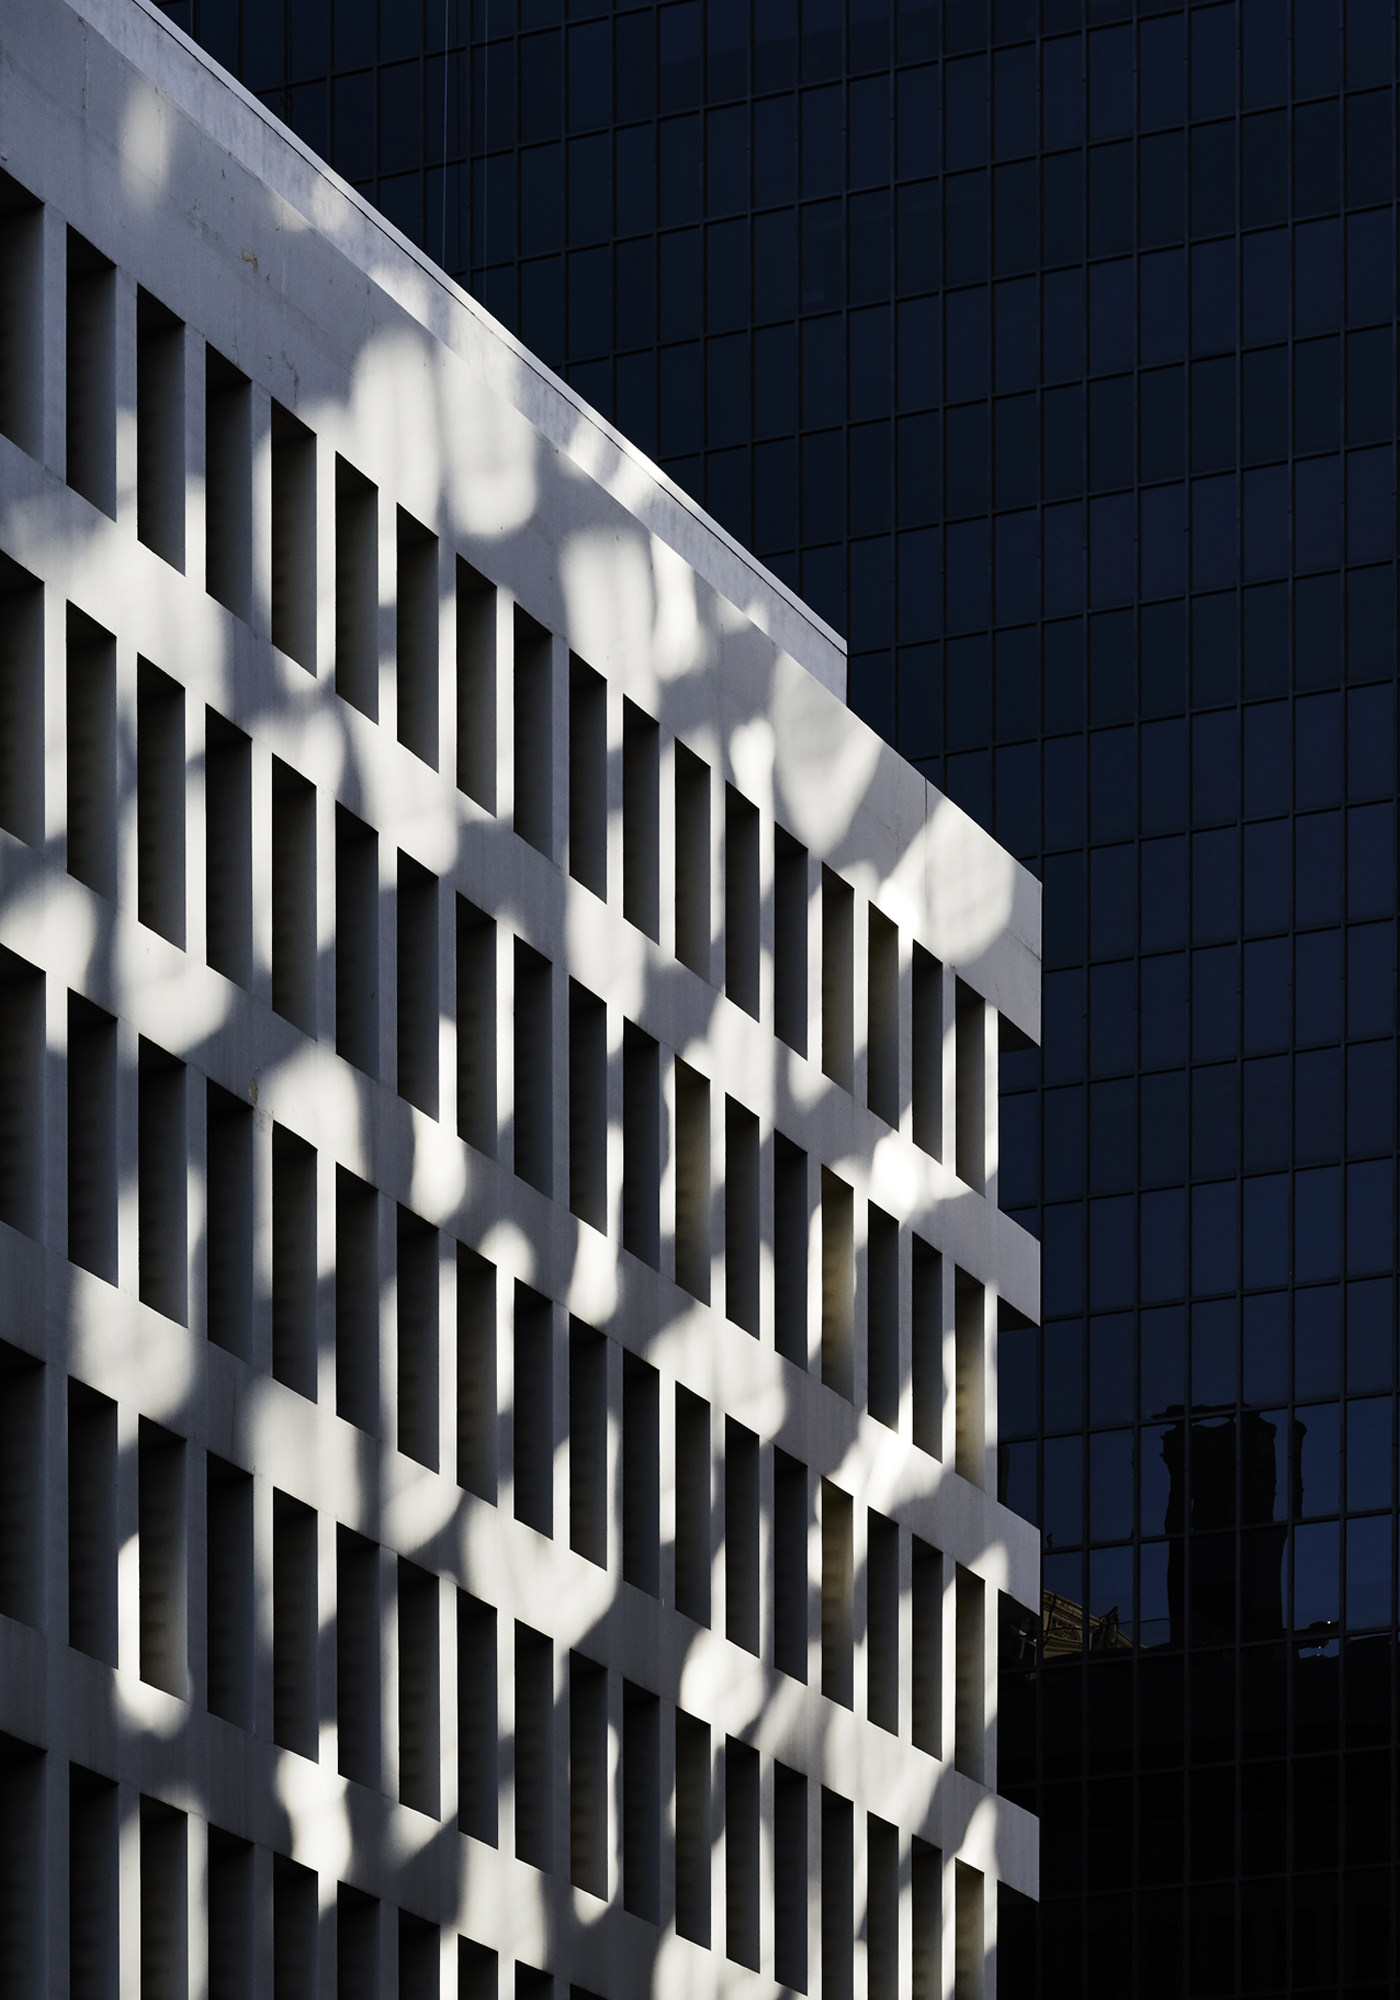 Wilshire Boulevard Série Photographie Adrian Gaut